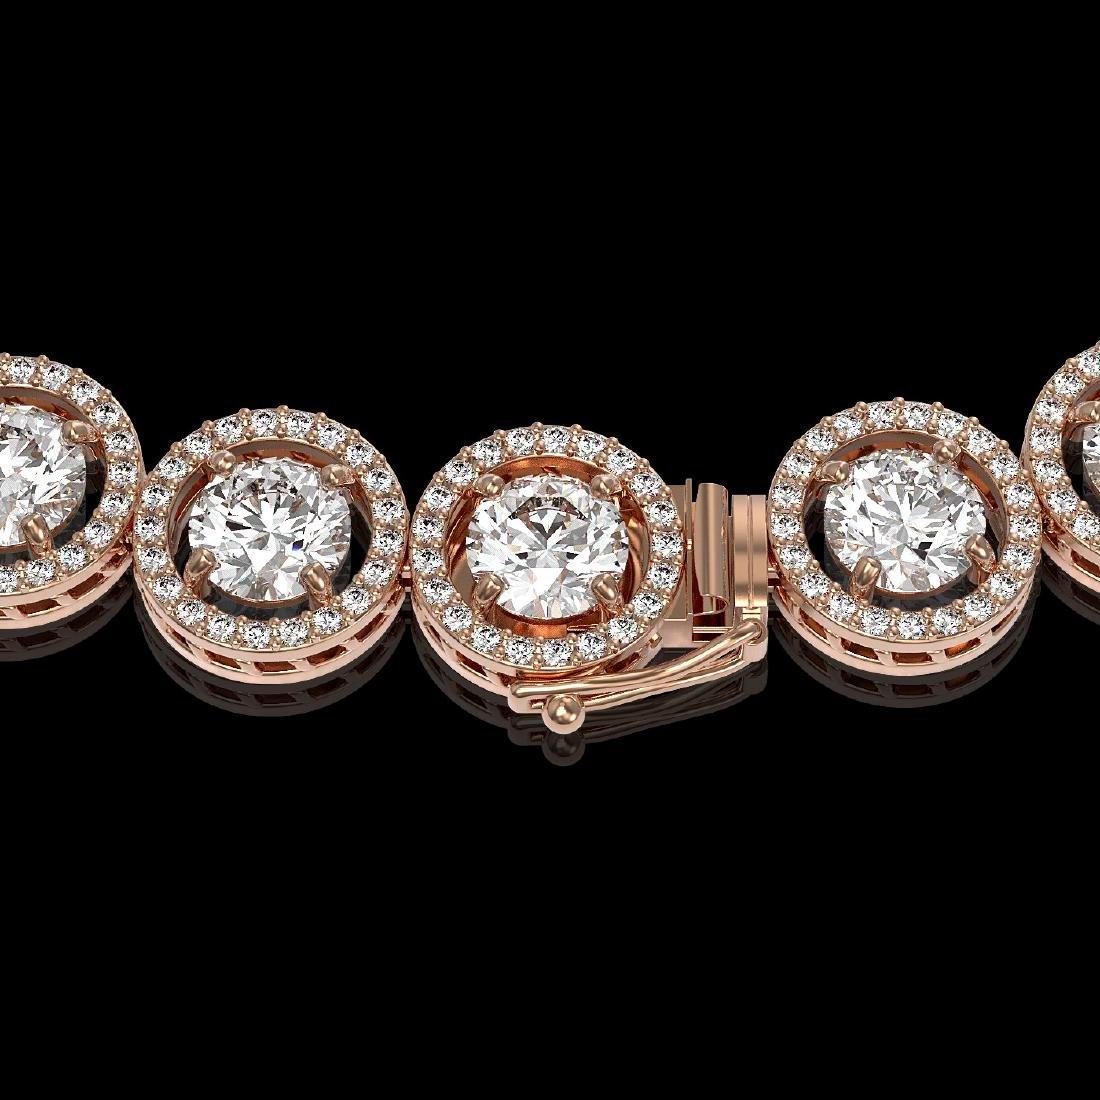 30.78 CTW Diamond Designer Necklace 18K Rose Gold - 3